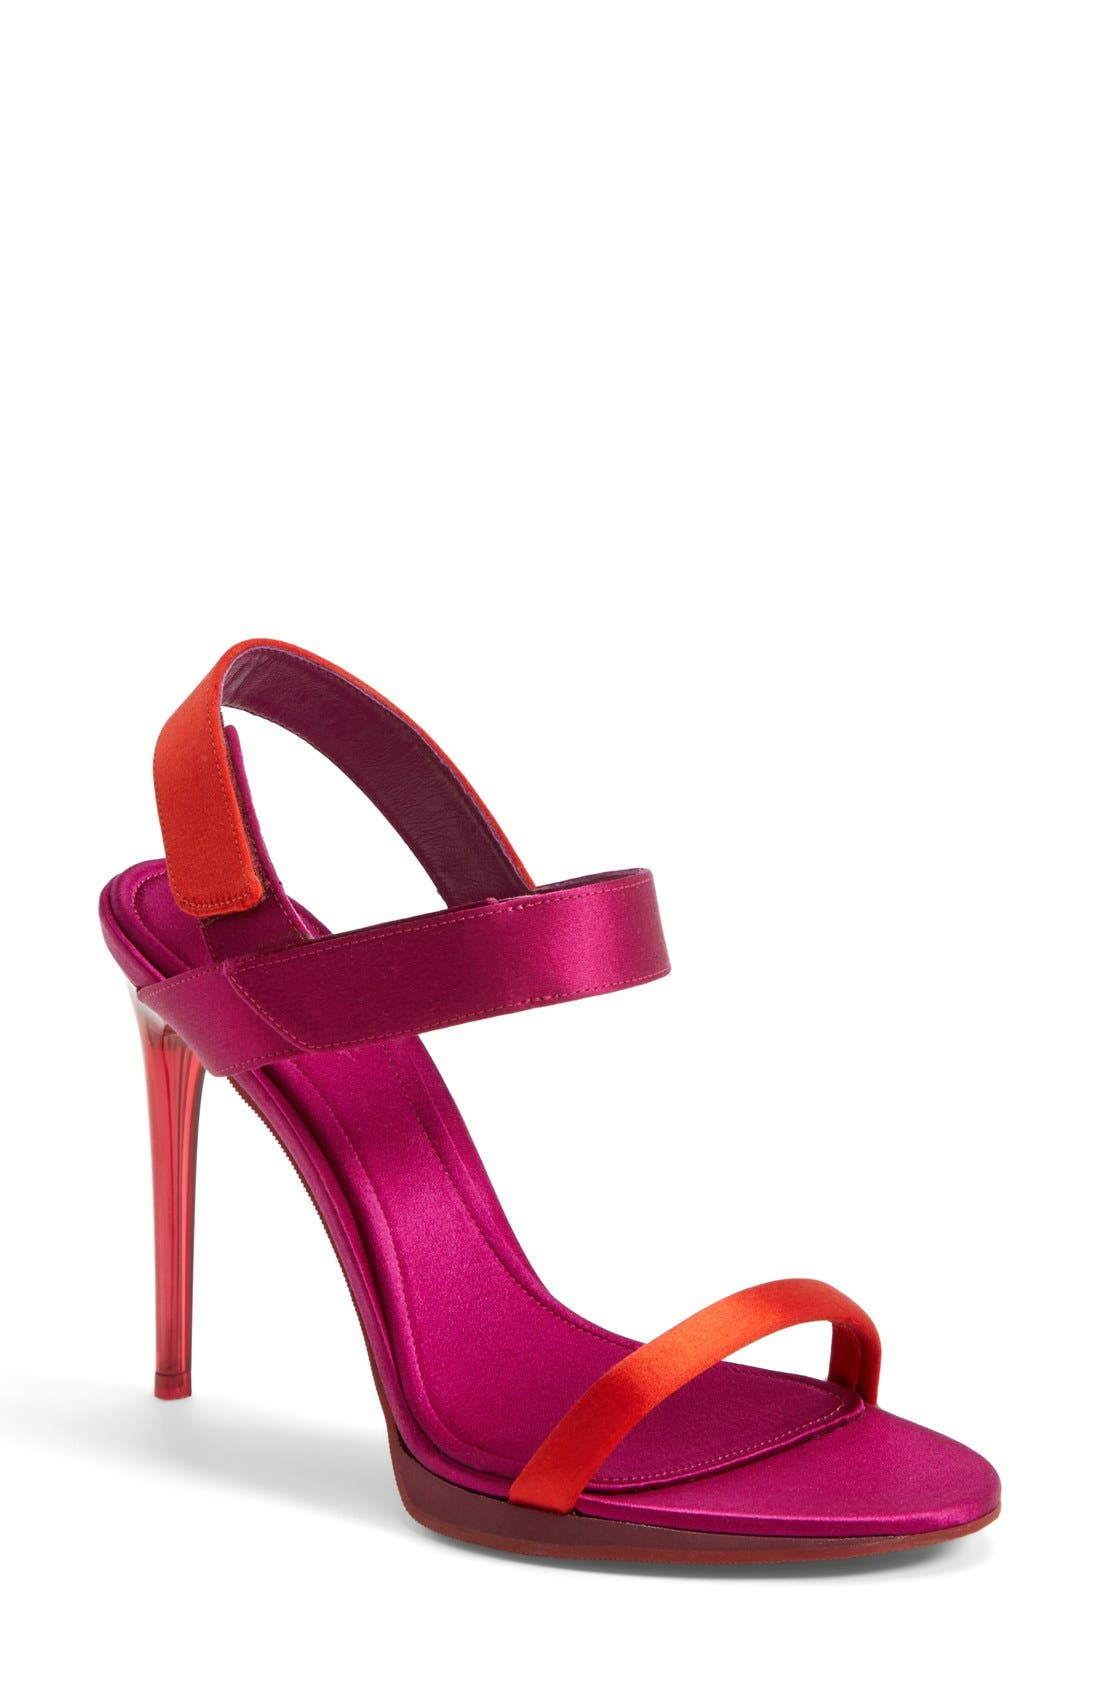 Main Image - Burberry 'Calcoat' Sandal (Women)